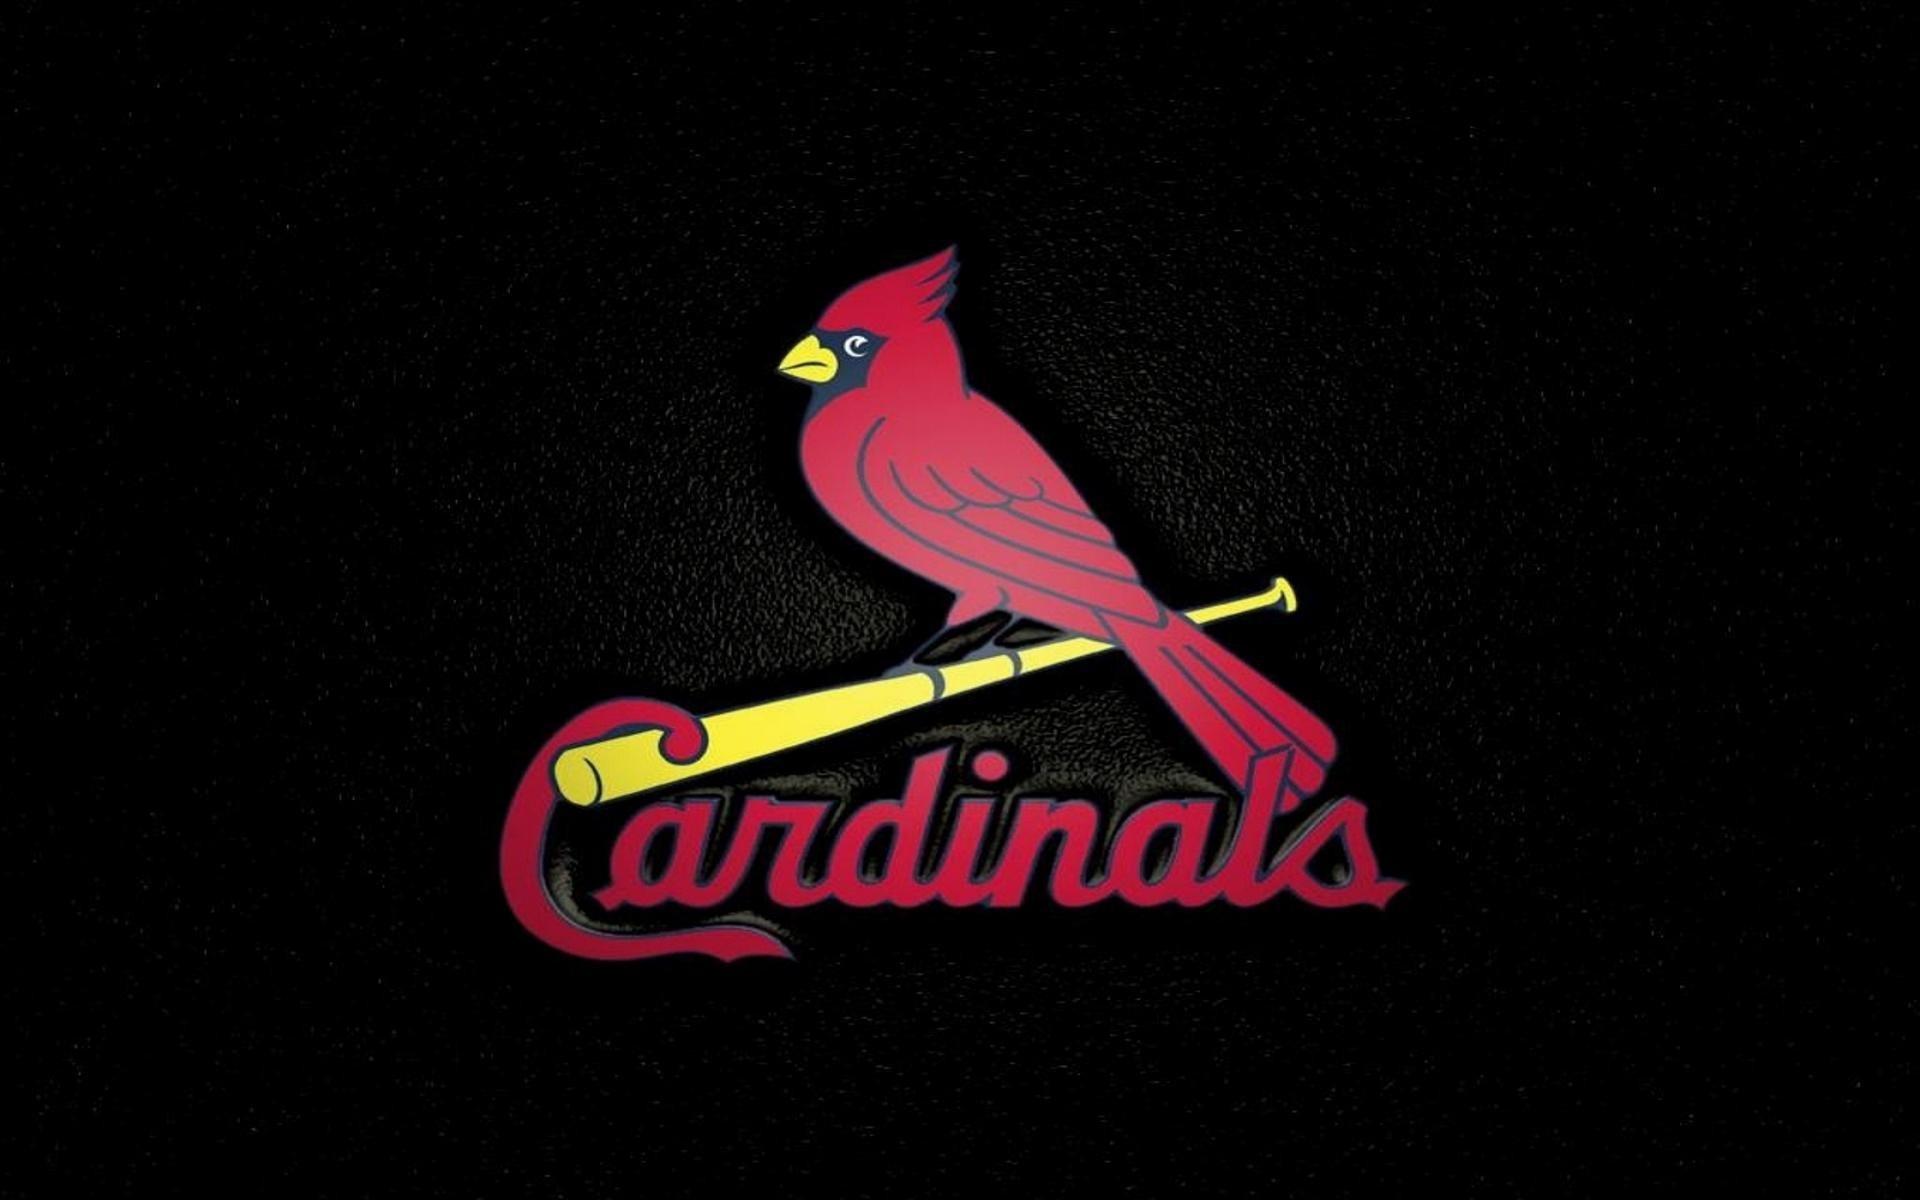 Backgrounds-hd-st-louis-cardinals-logo